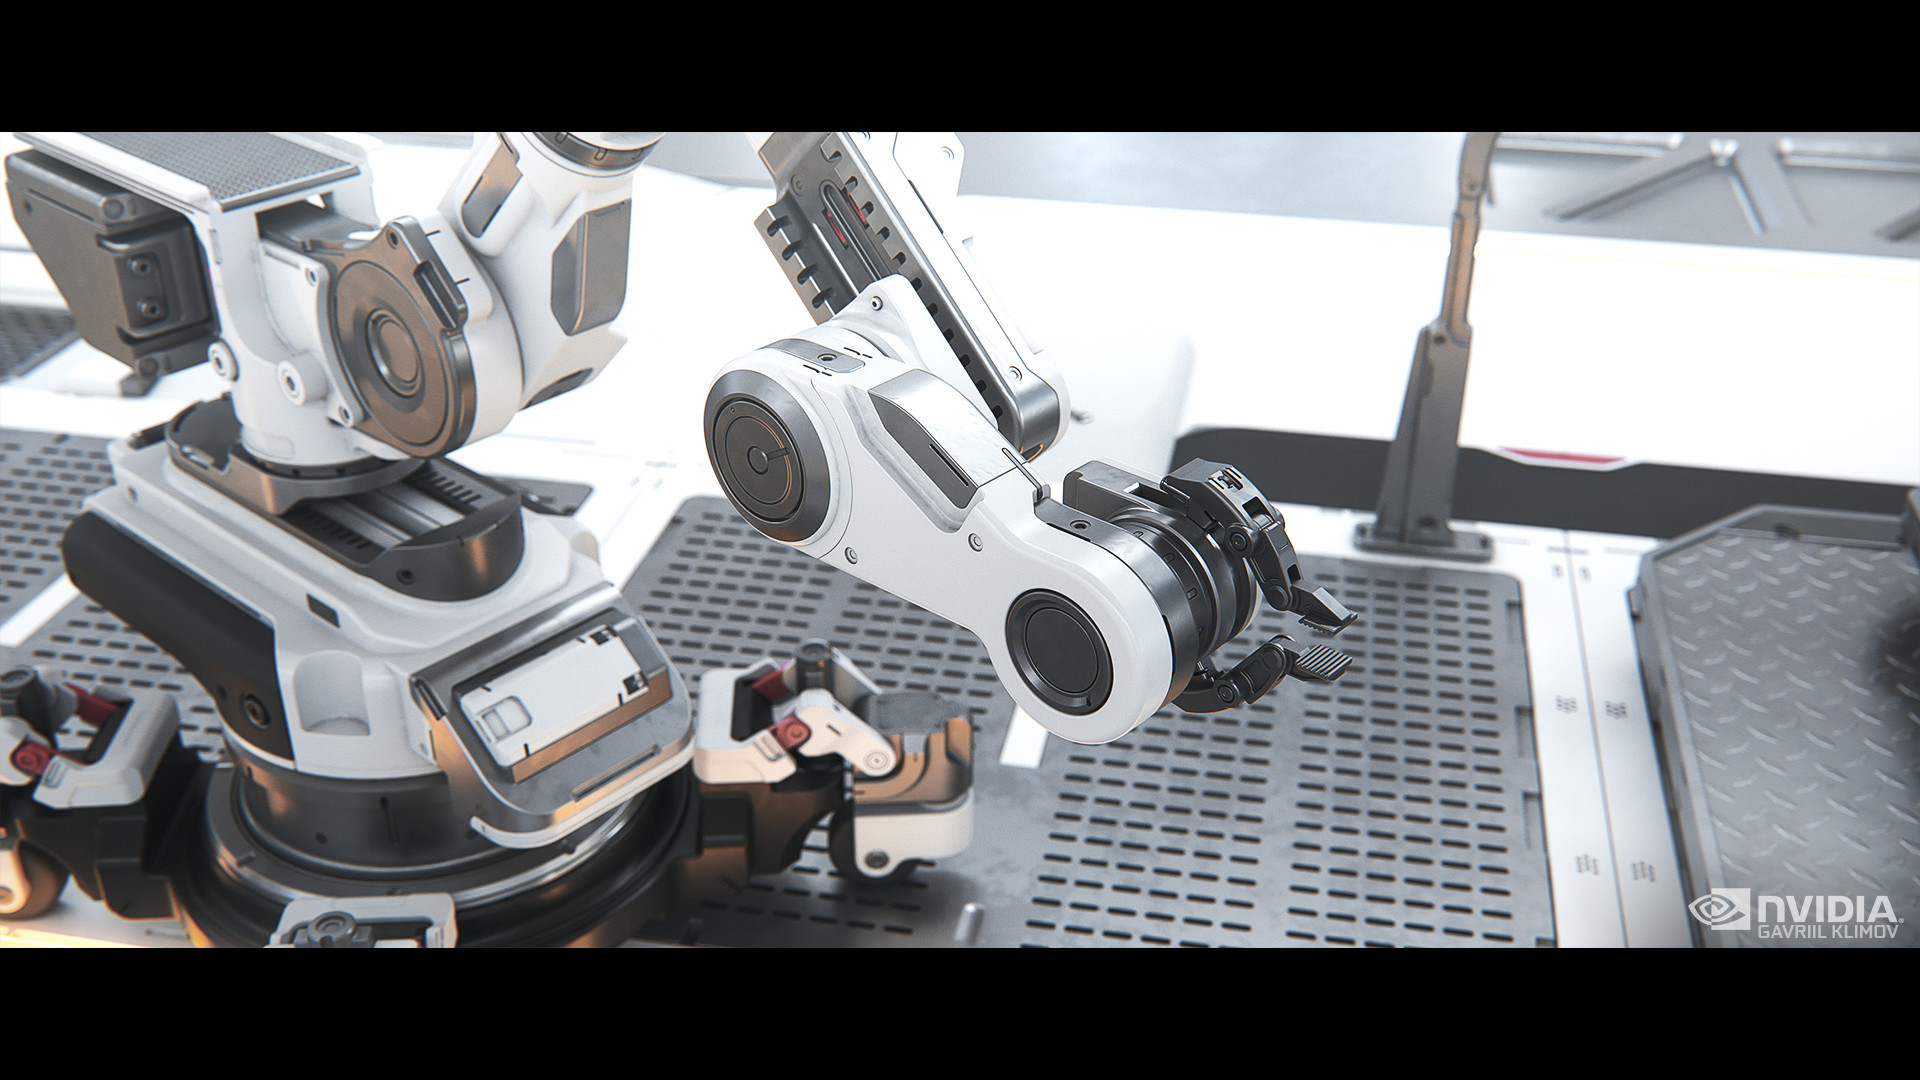 Robotic arm by Gregor Kopka: https://www.artstation.com/scrutch